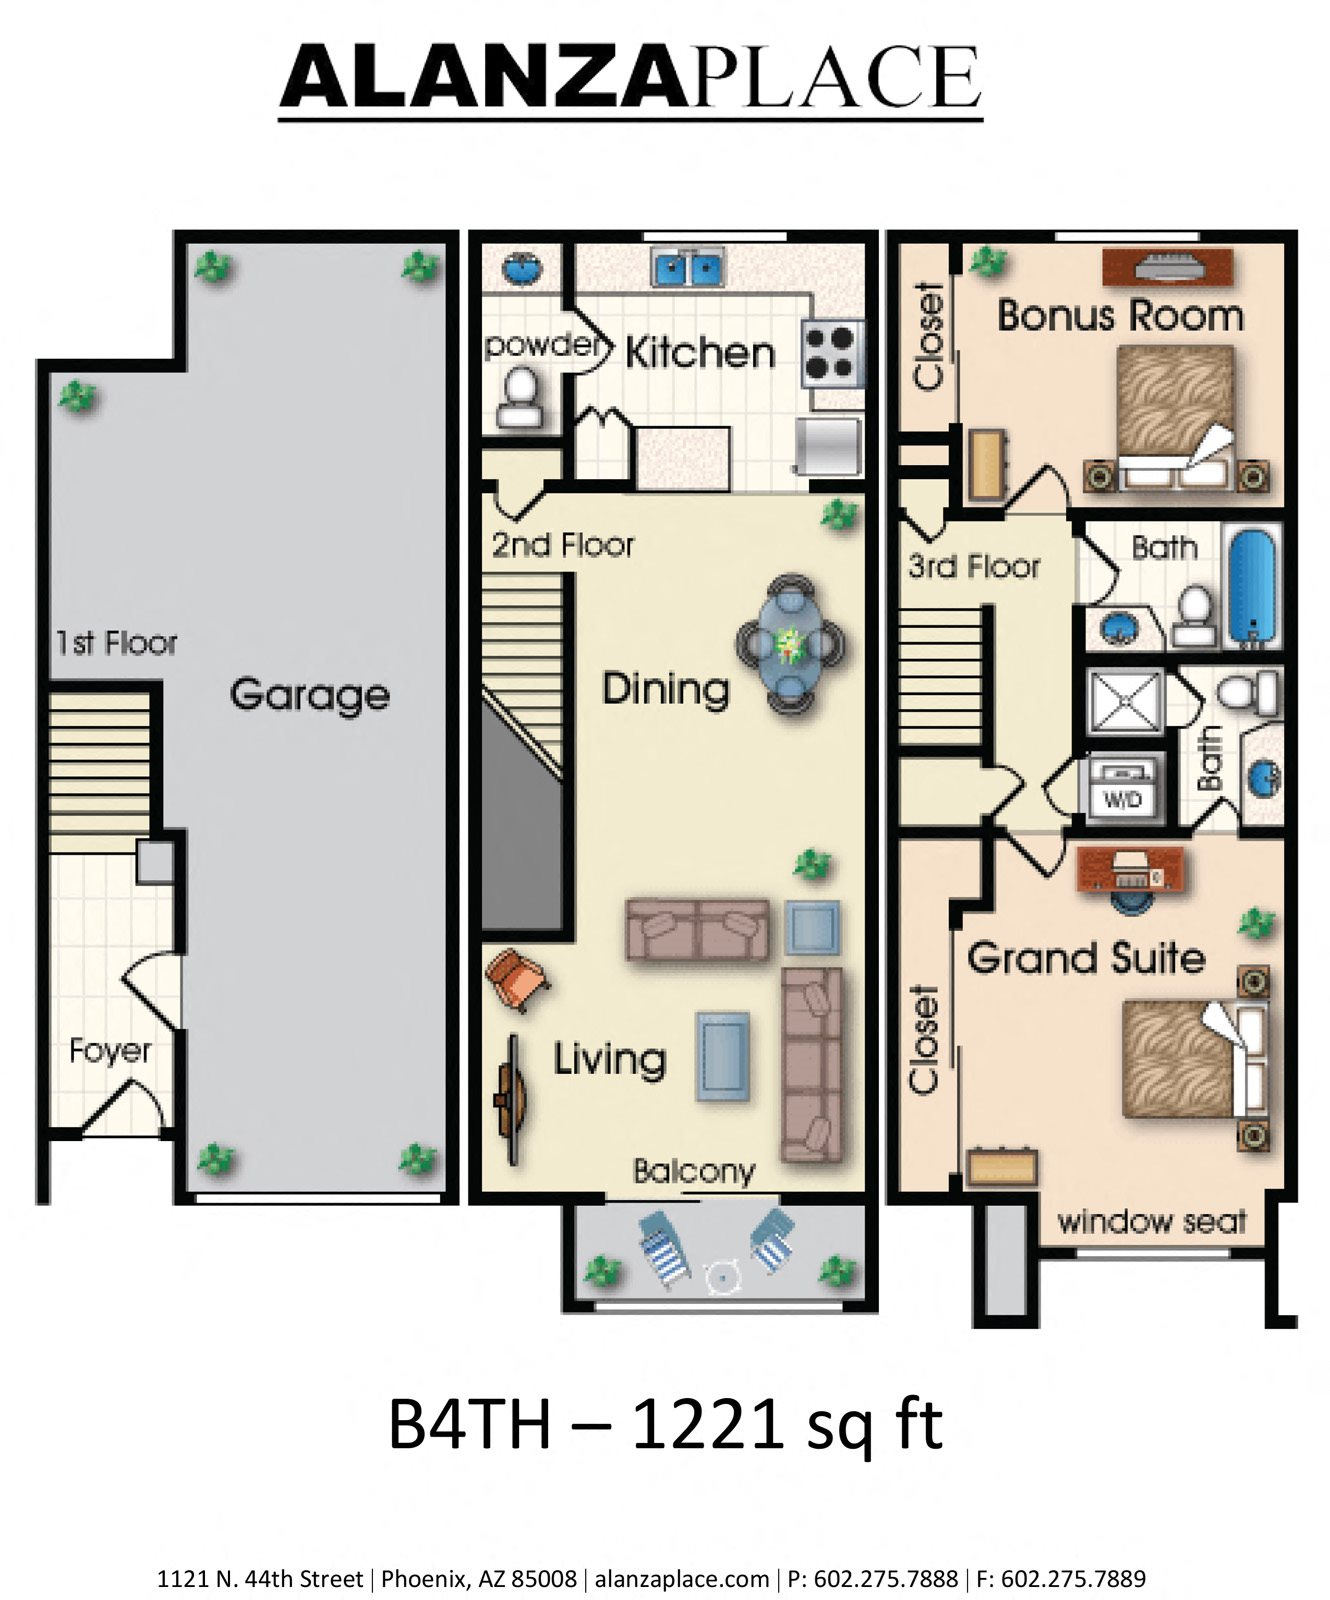 B4TH Floor Plan 9